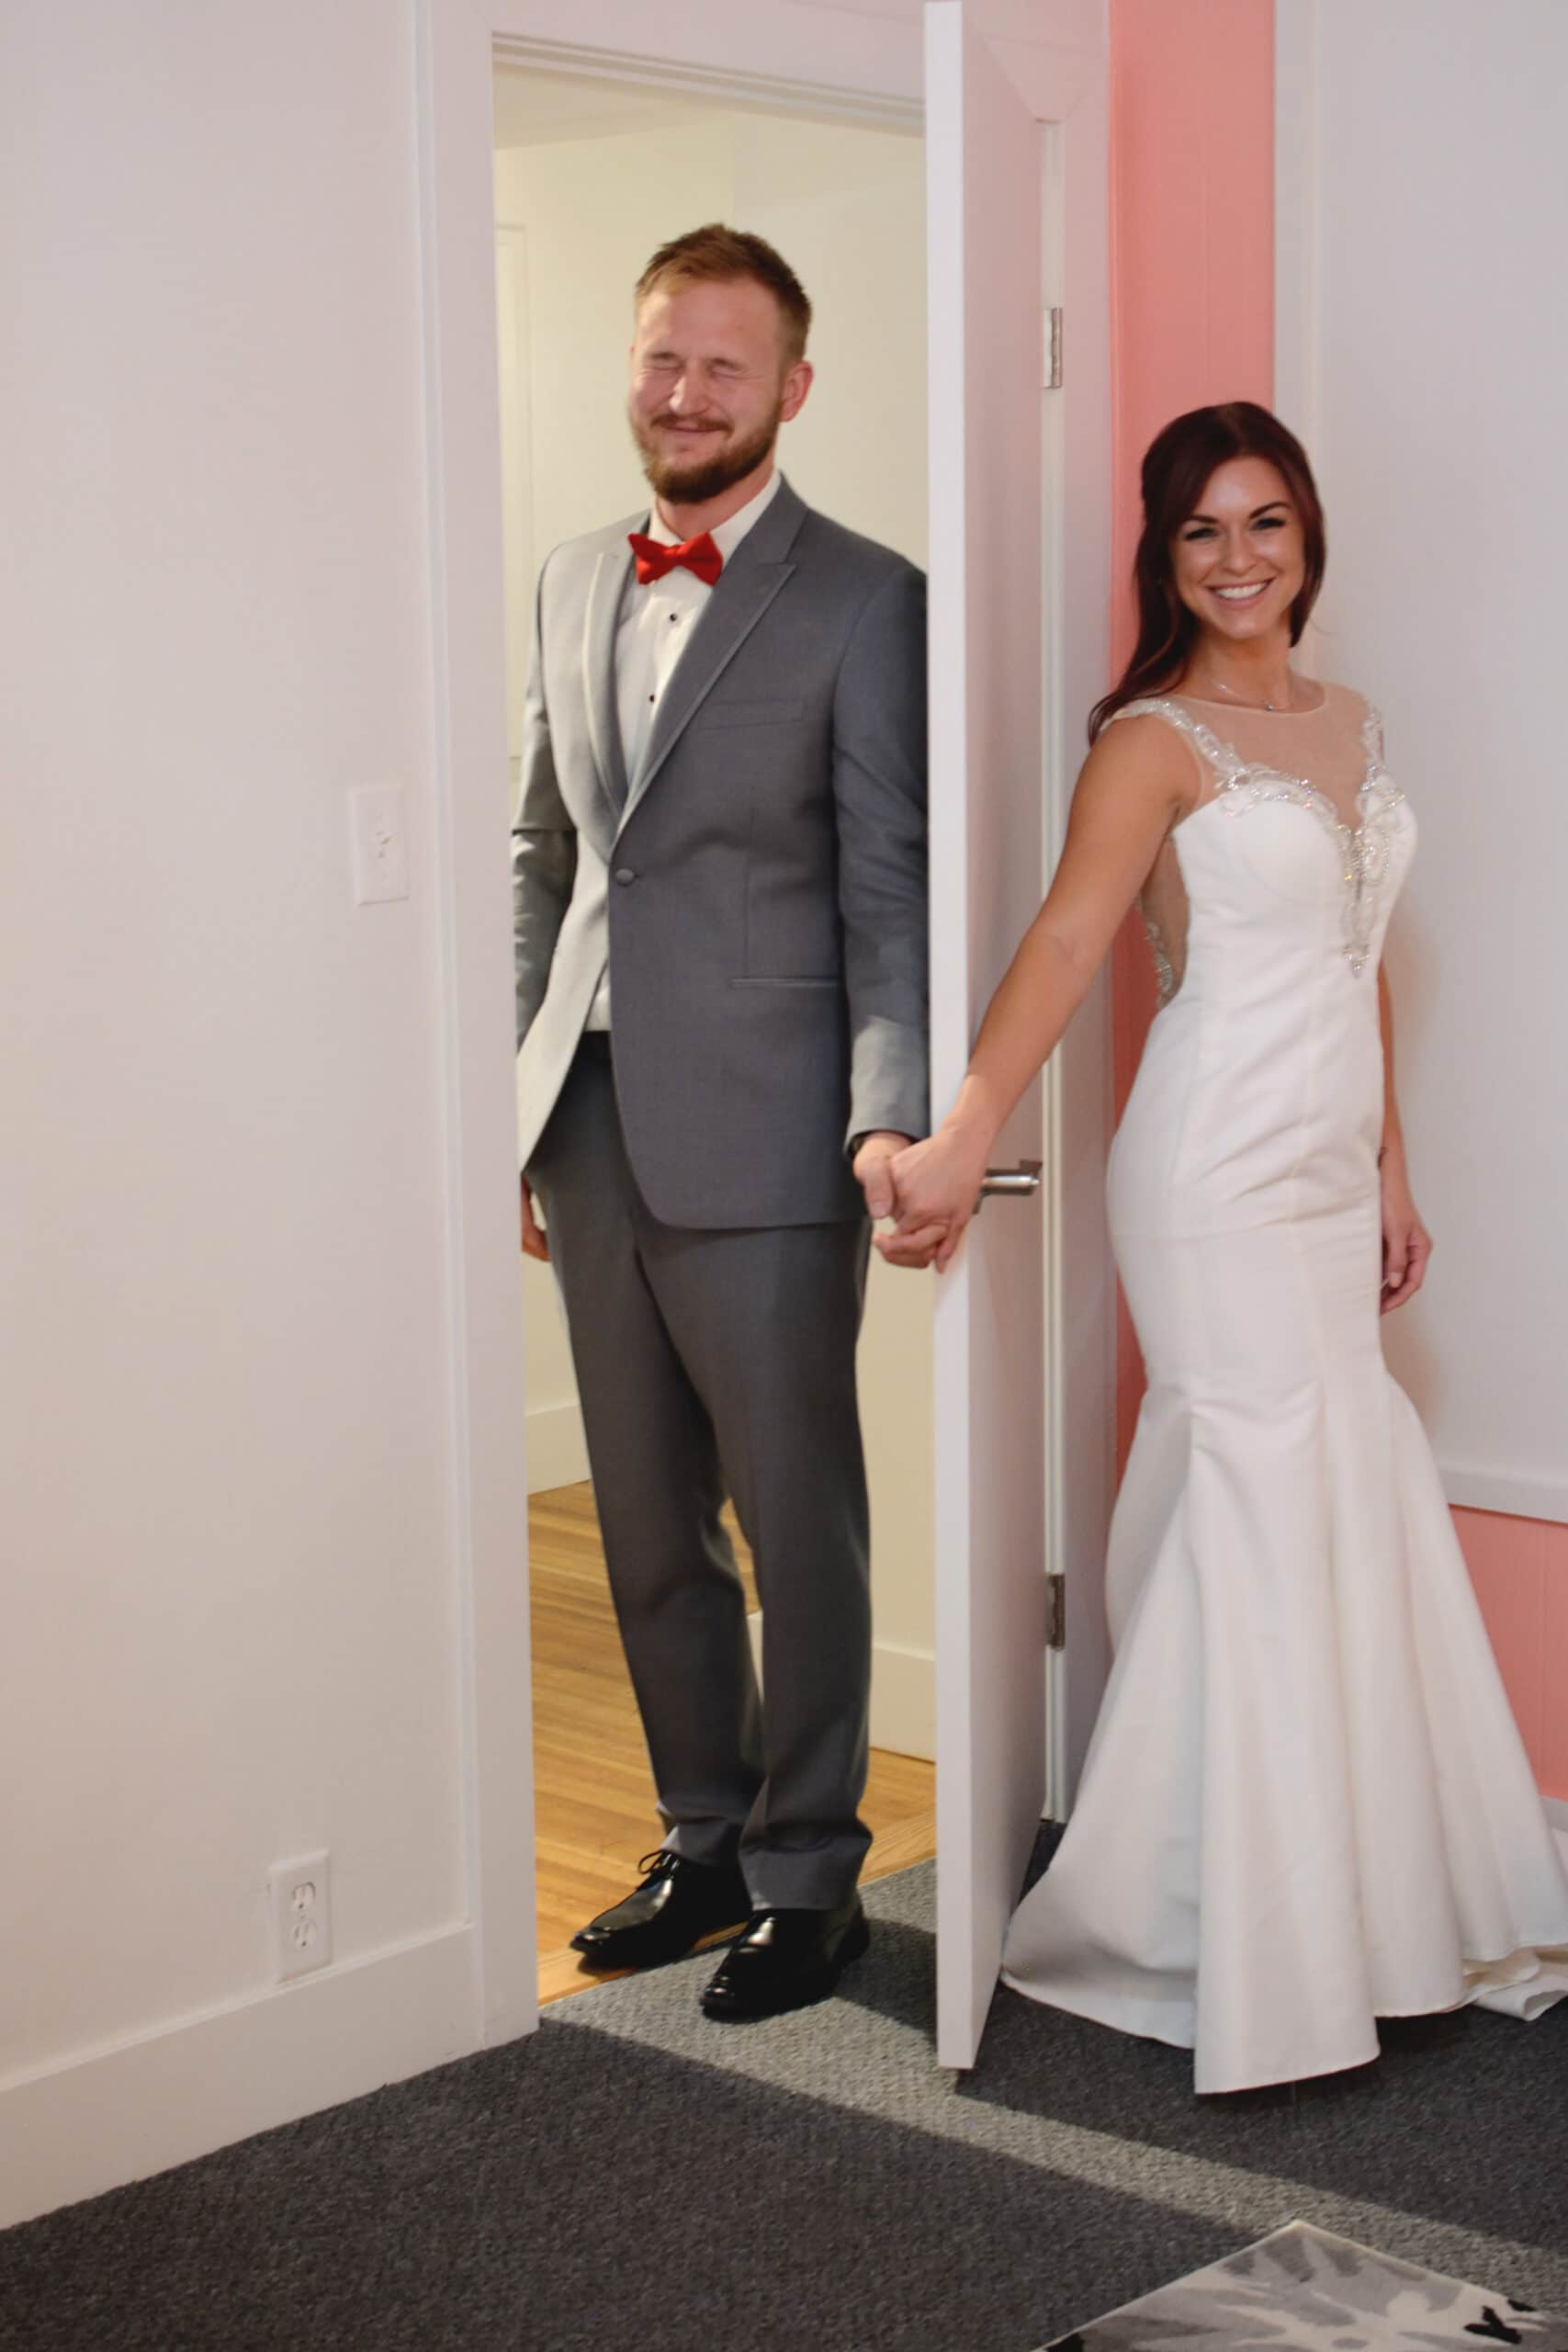 las vegas wedding unity ceremony